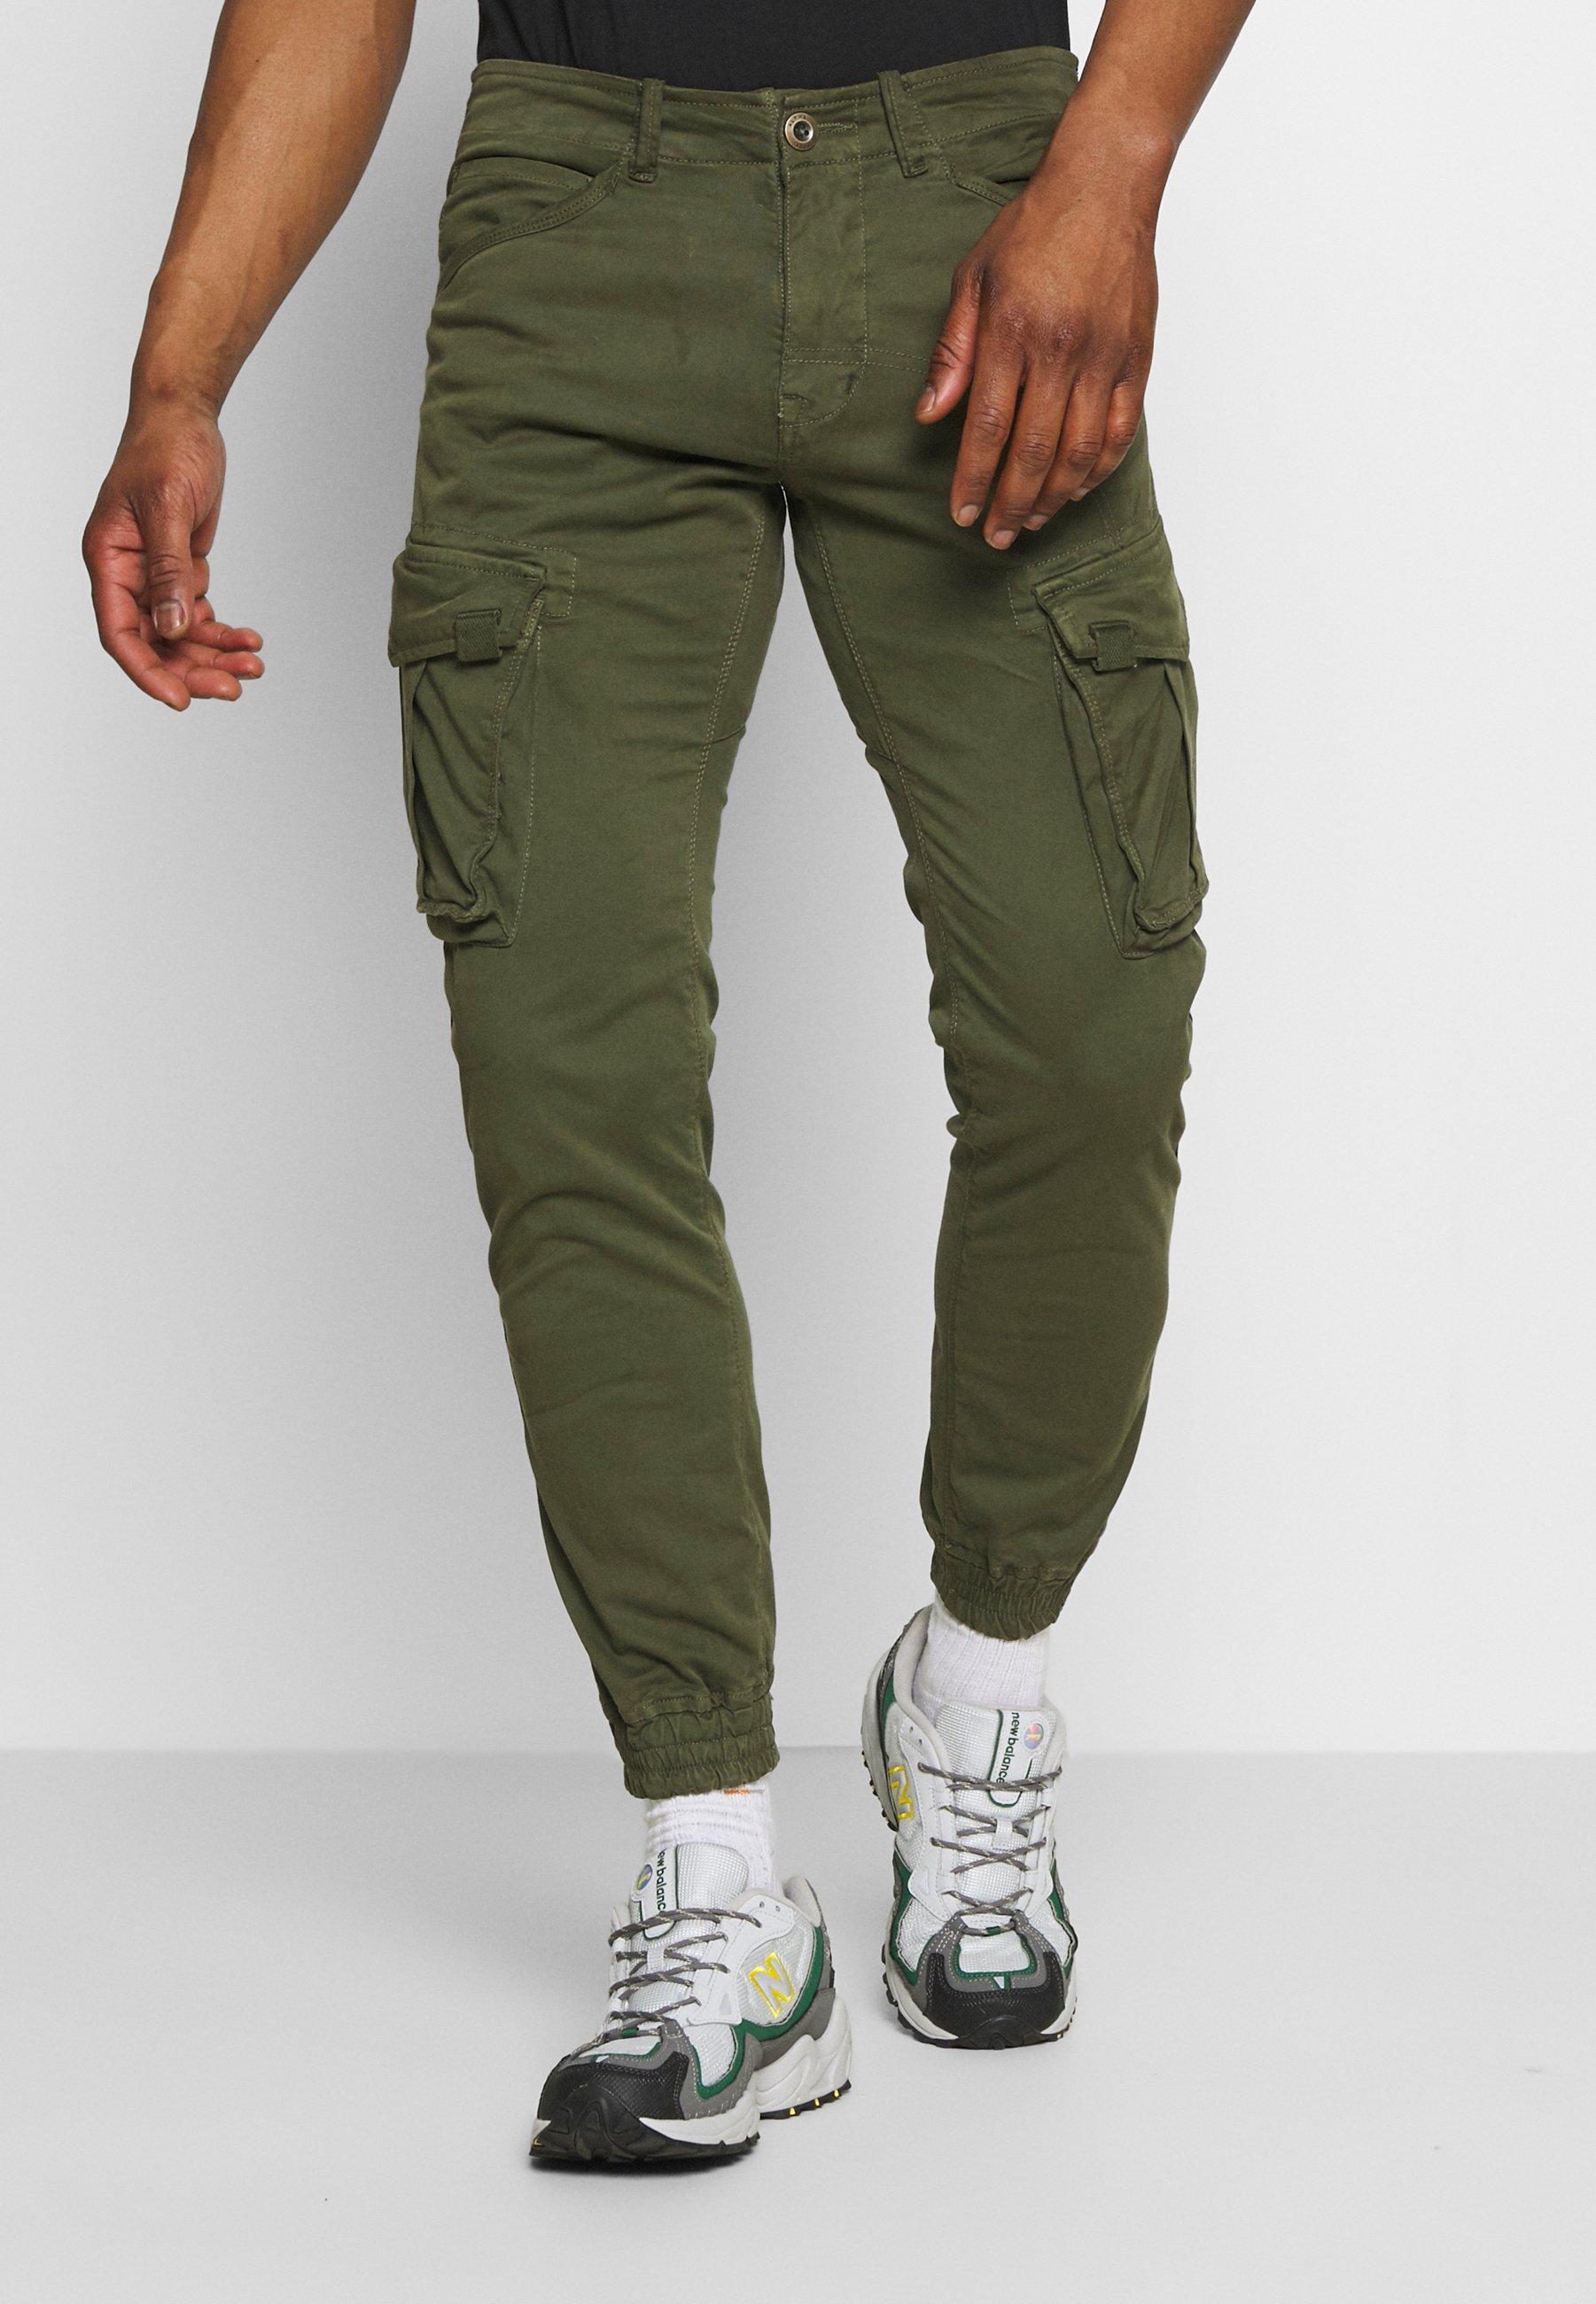 Homme SPY PANT - Pantalon cargo